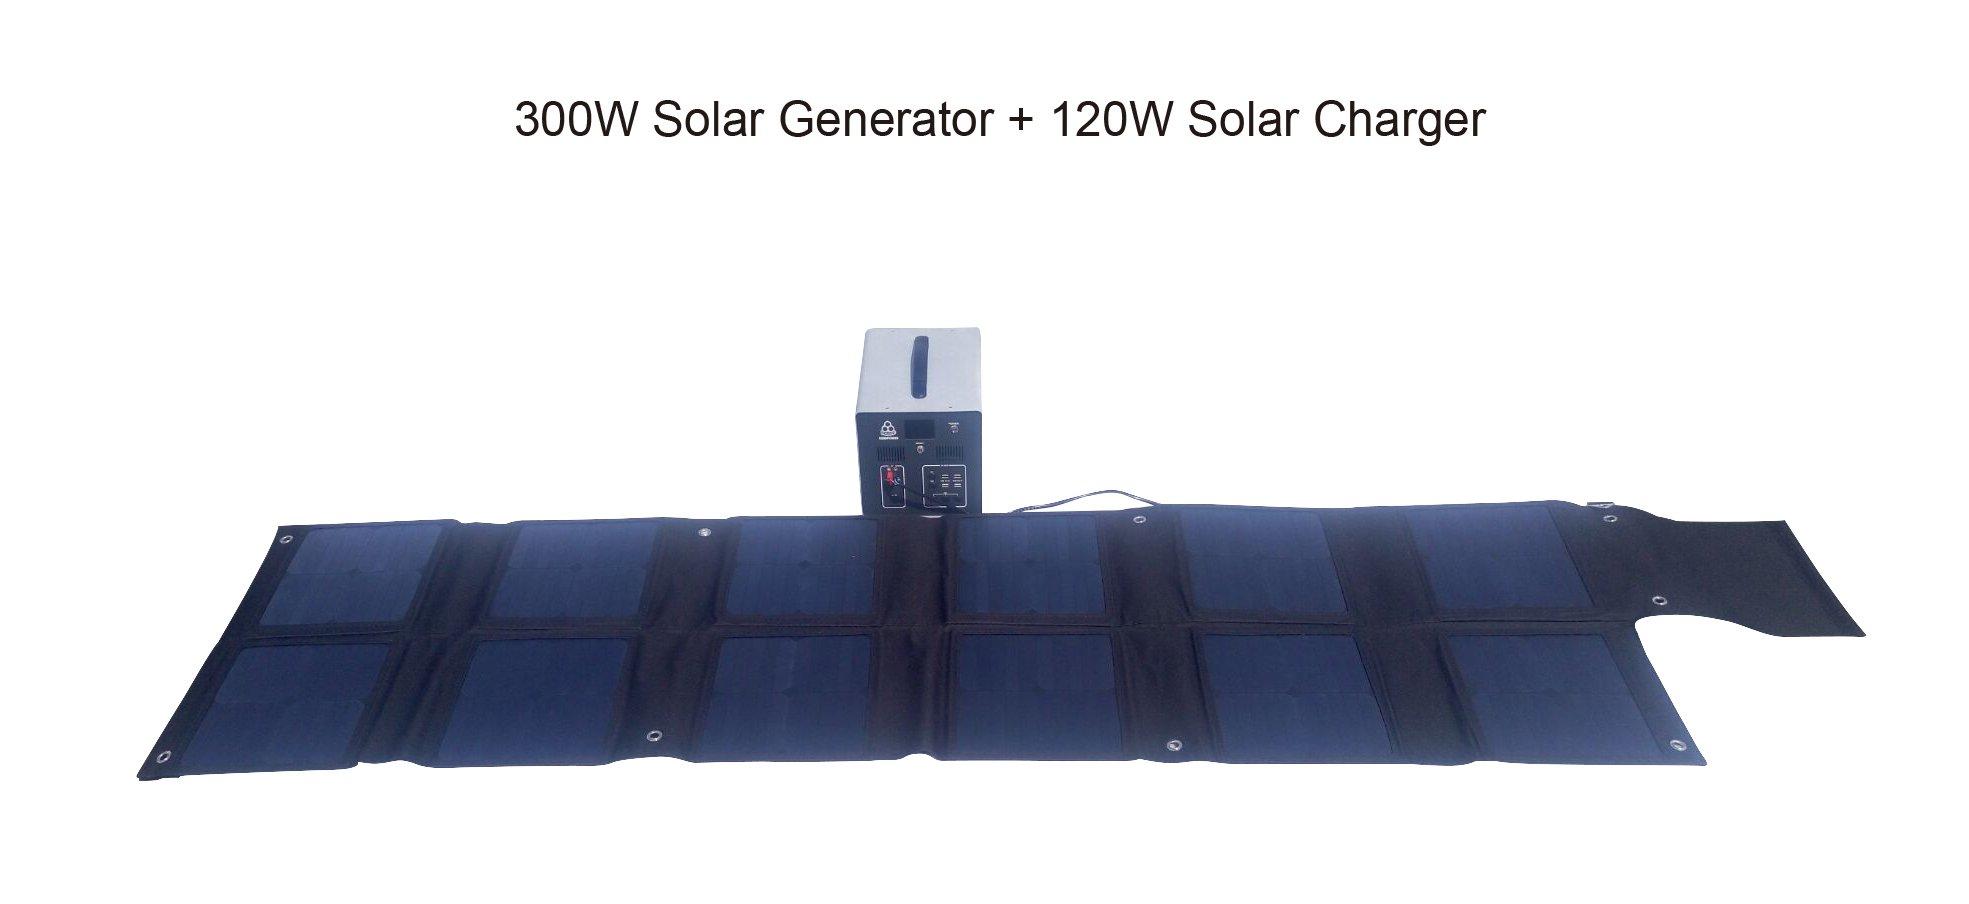 MEGASOLAR 300W Solar Generator Solar System with 288Wh LiFePO4 battery, Solar & AC Input, 300w 110v AC Inverter 4 USB 2 QC3.0 312v 15v 20v DC output, TFT Display, charged by Solar Charger Solar Panel